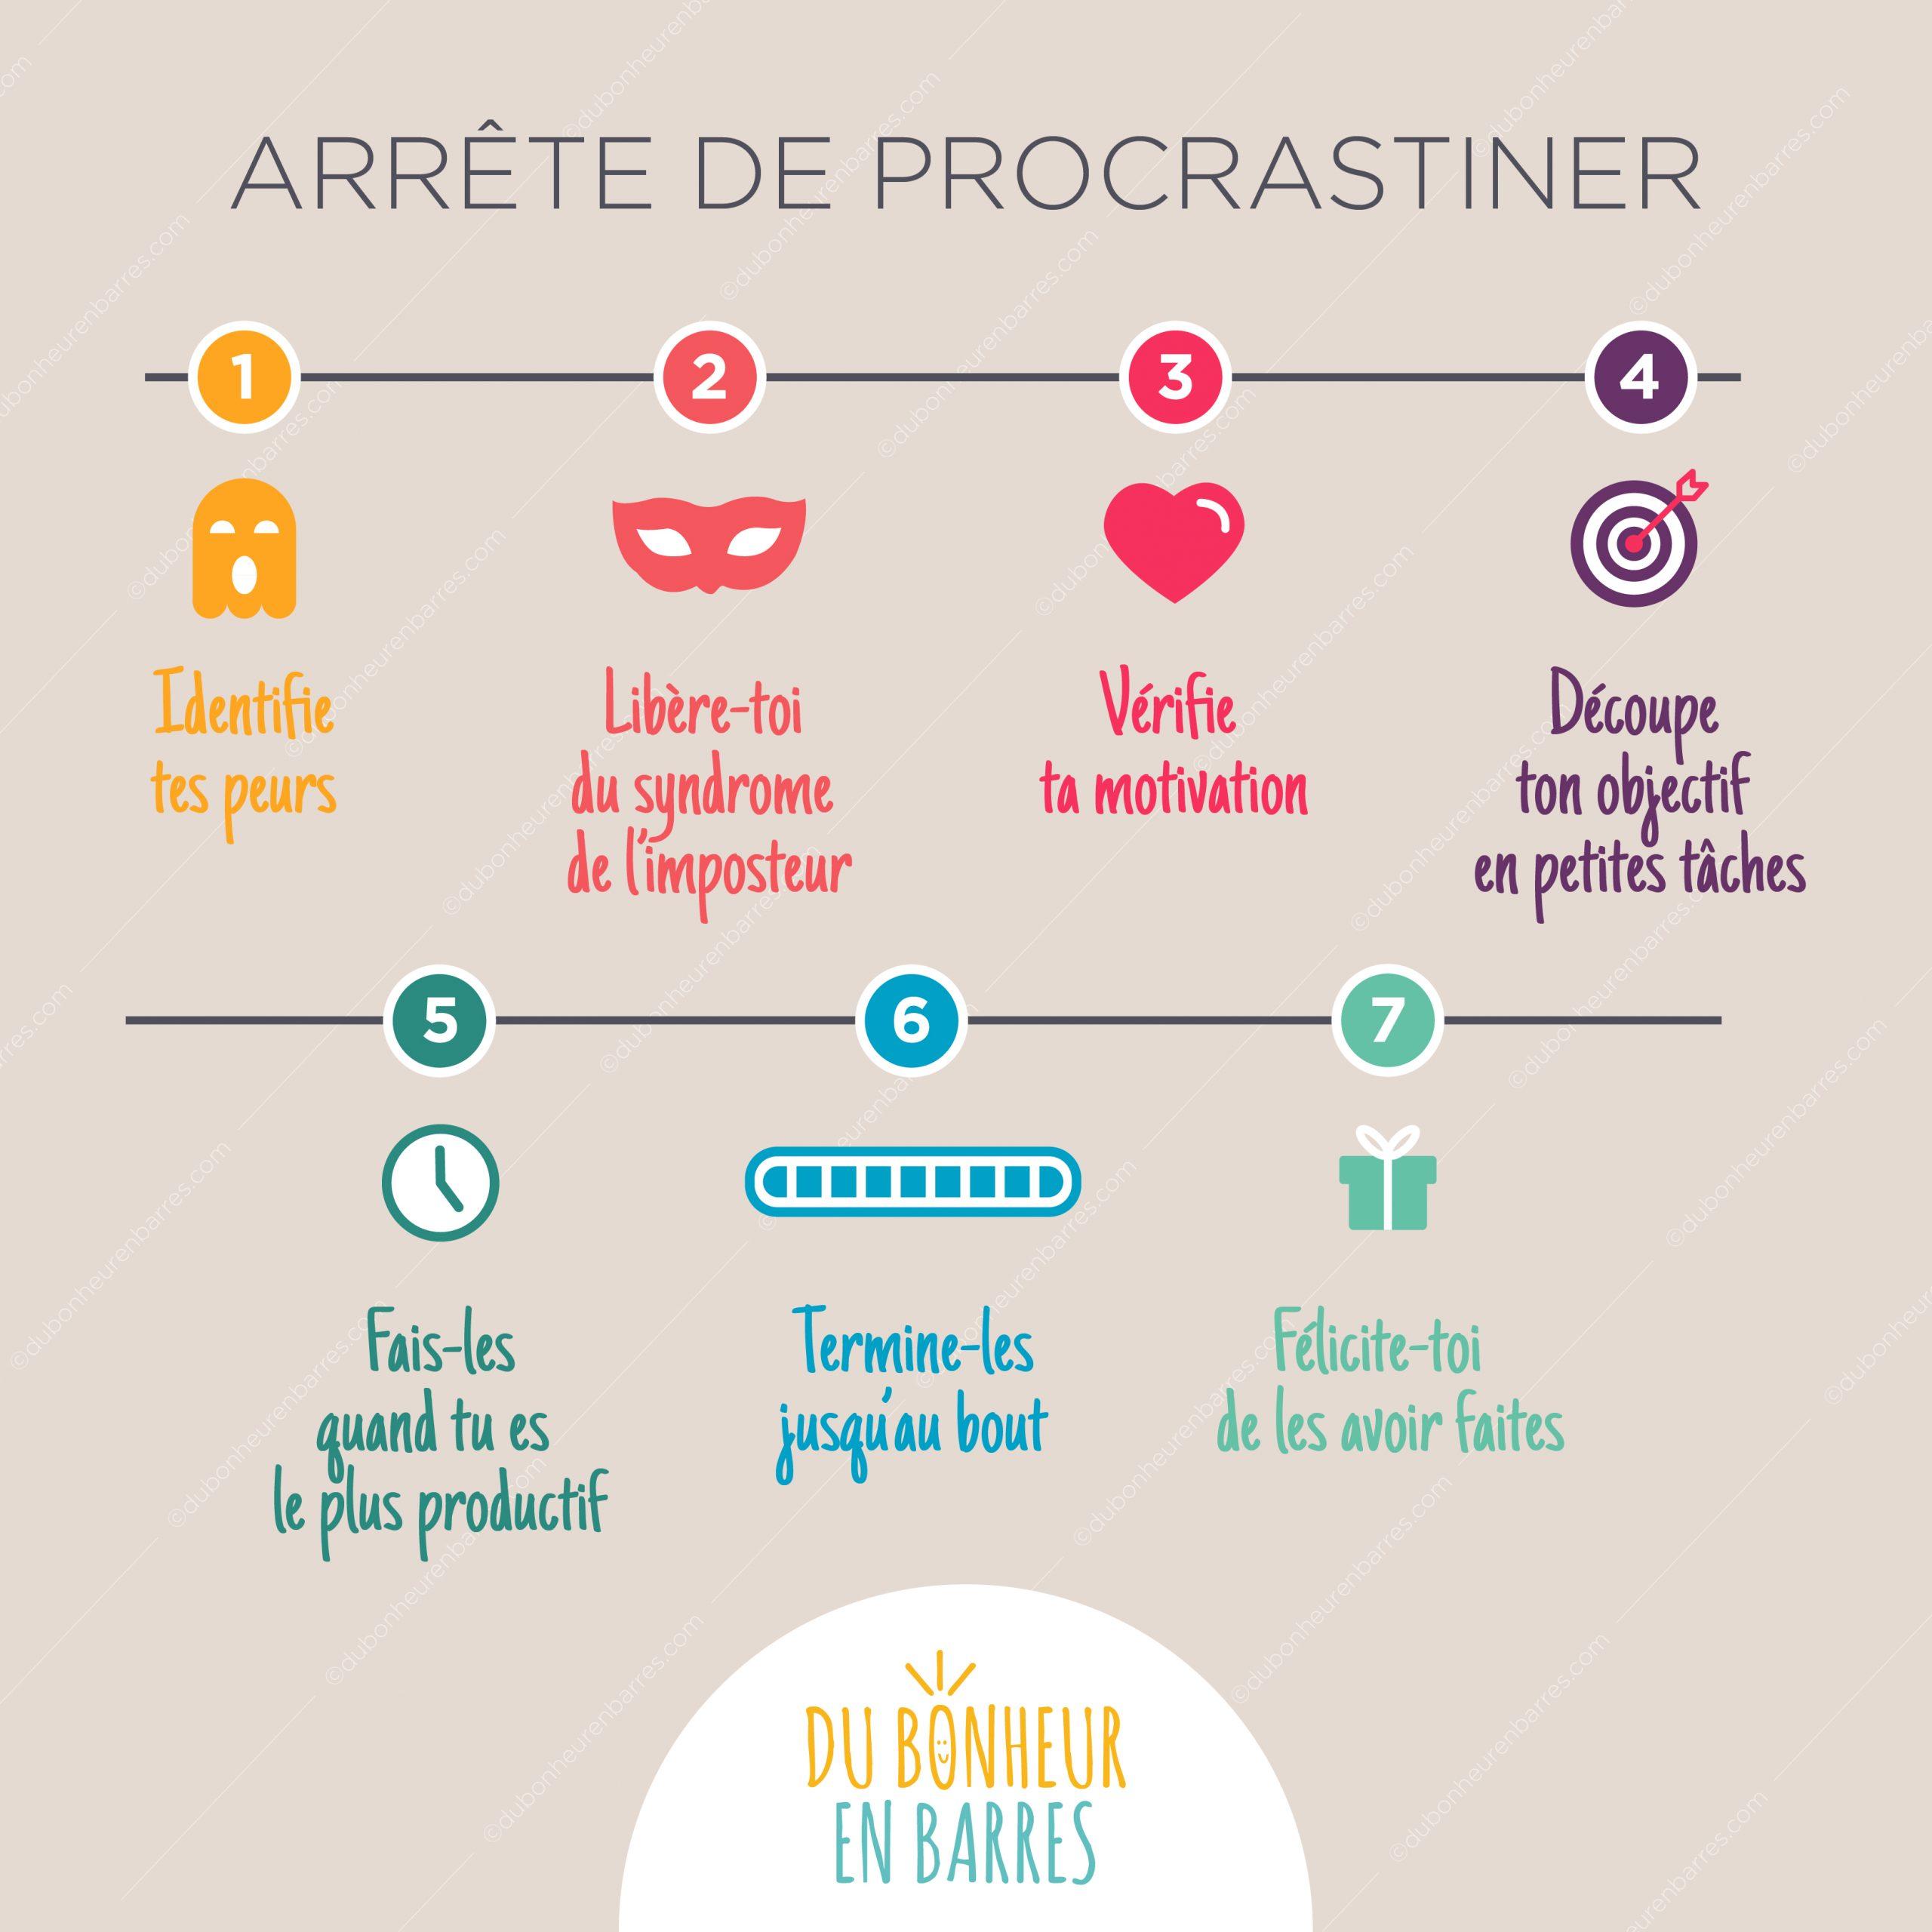 Arrête de procrastiner en 7 étapes